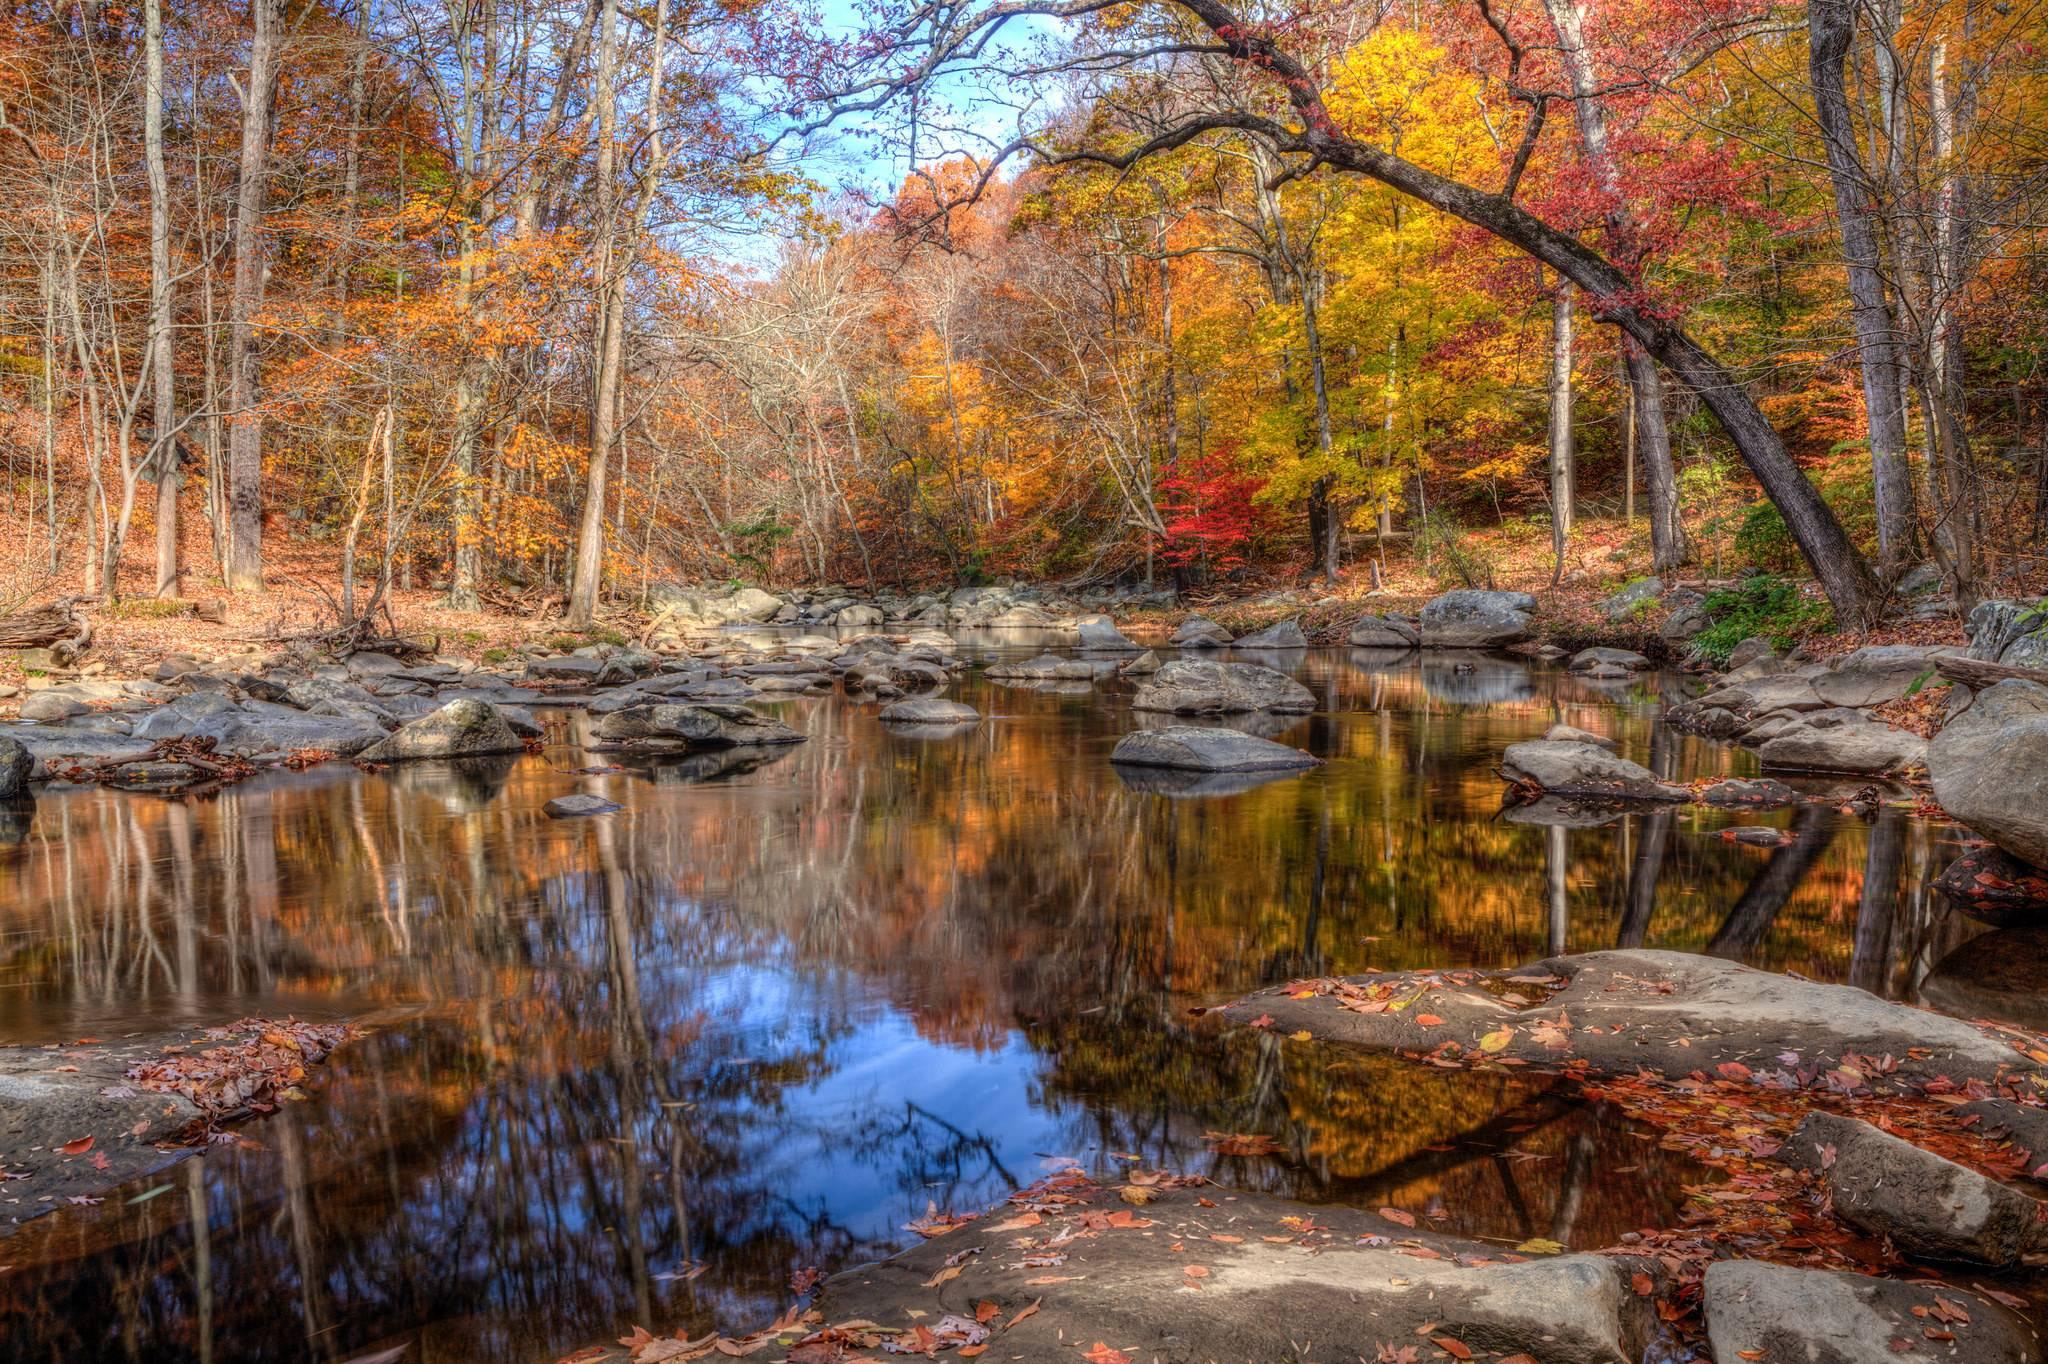 осень, лес, водоём